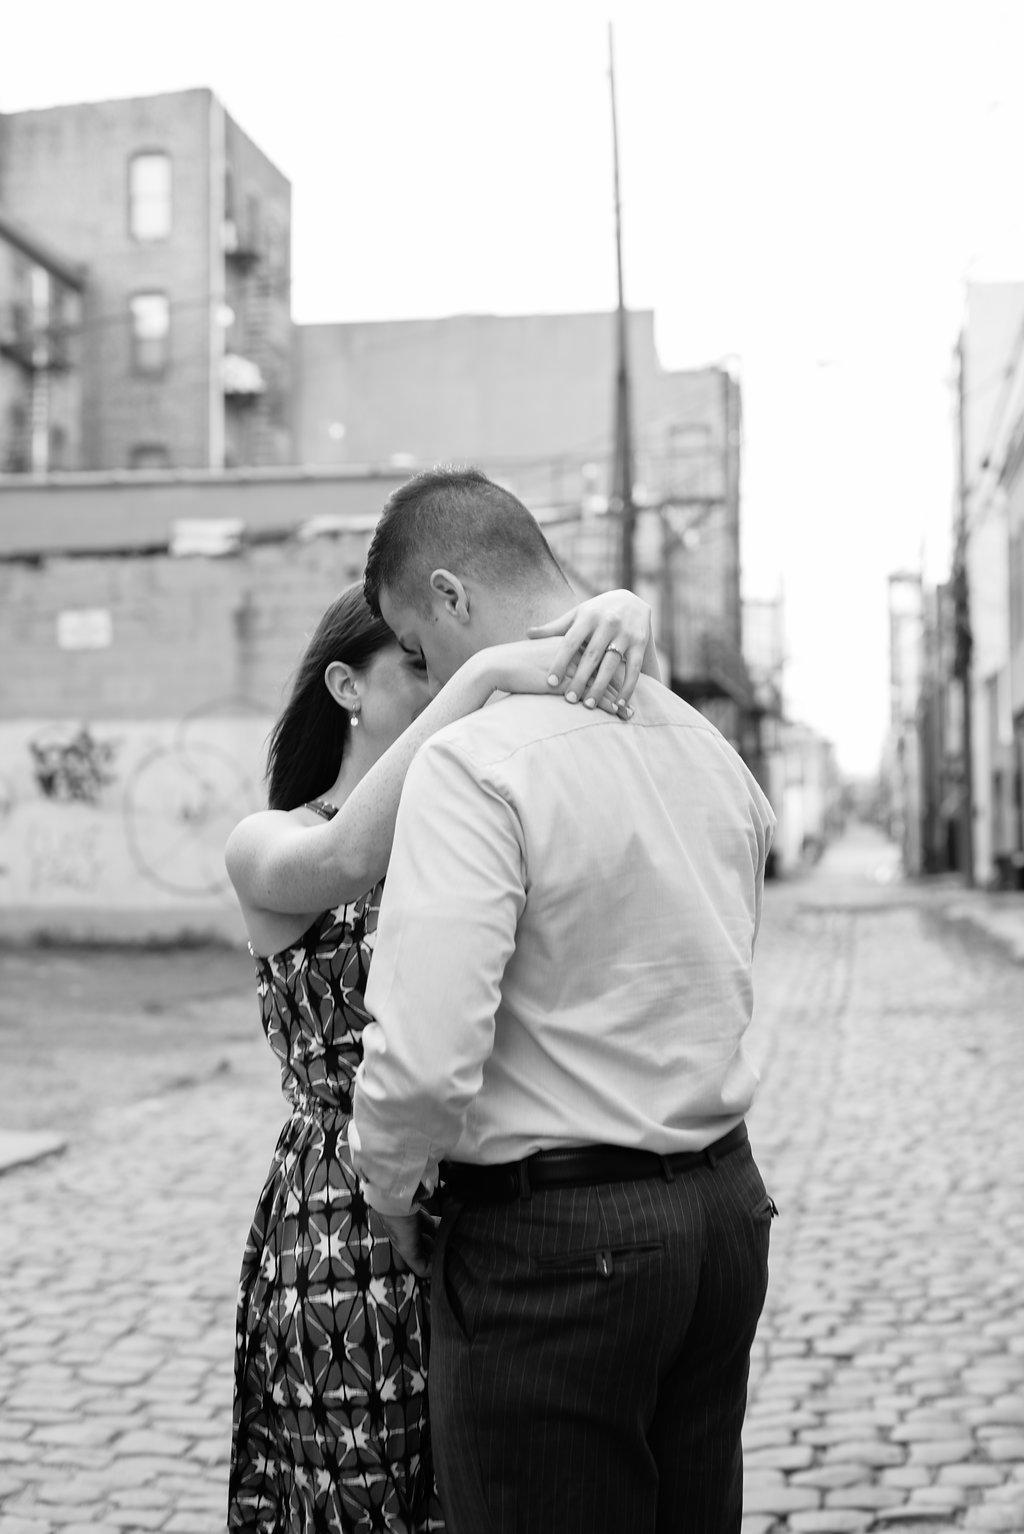 HobokenWaterfrontEngagementSession-NewYorkCitySkyline-NewJersey-Cait+Paul-OliviaChristinaPhoto-1(4).jpg